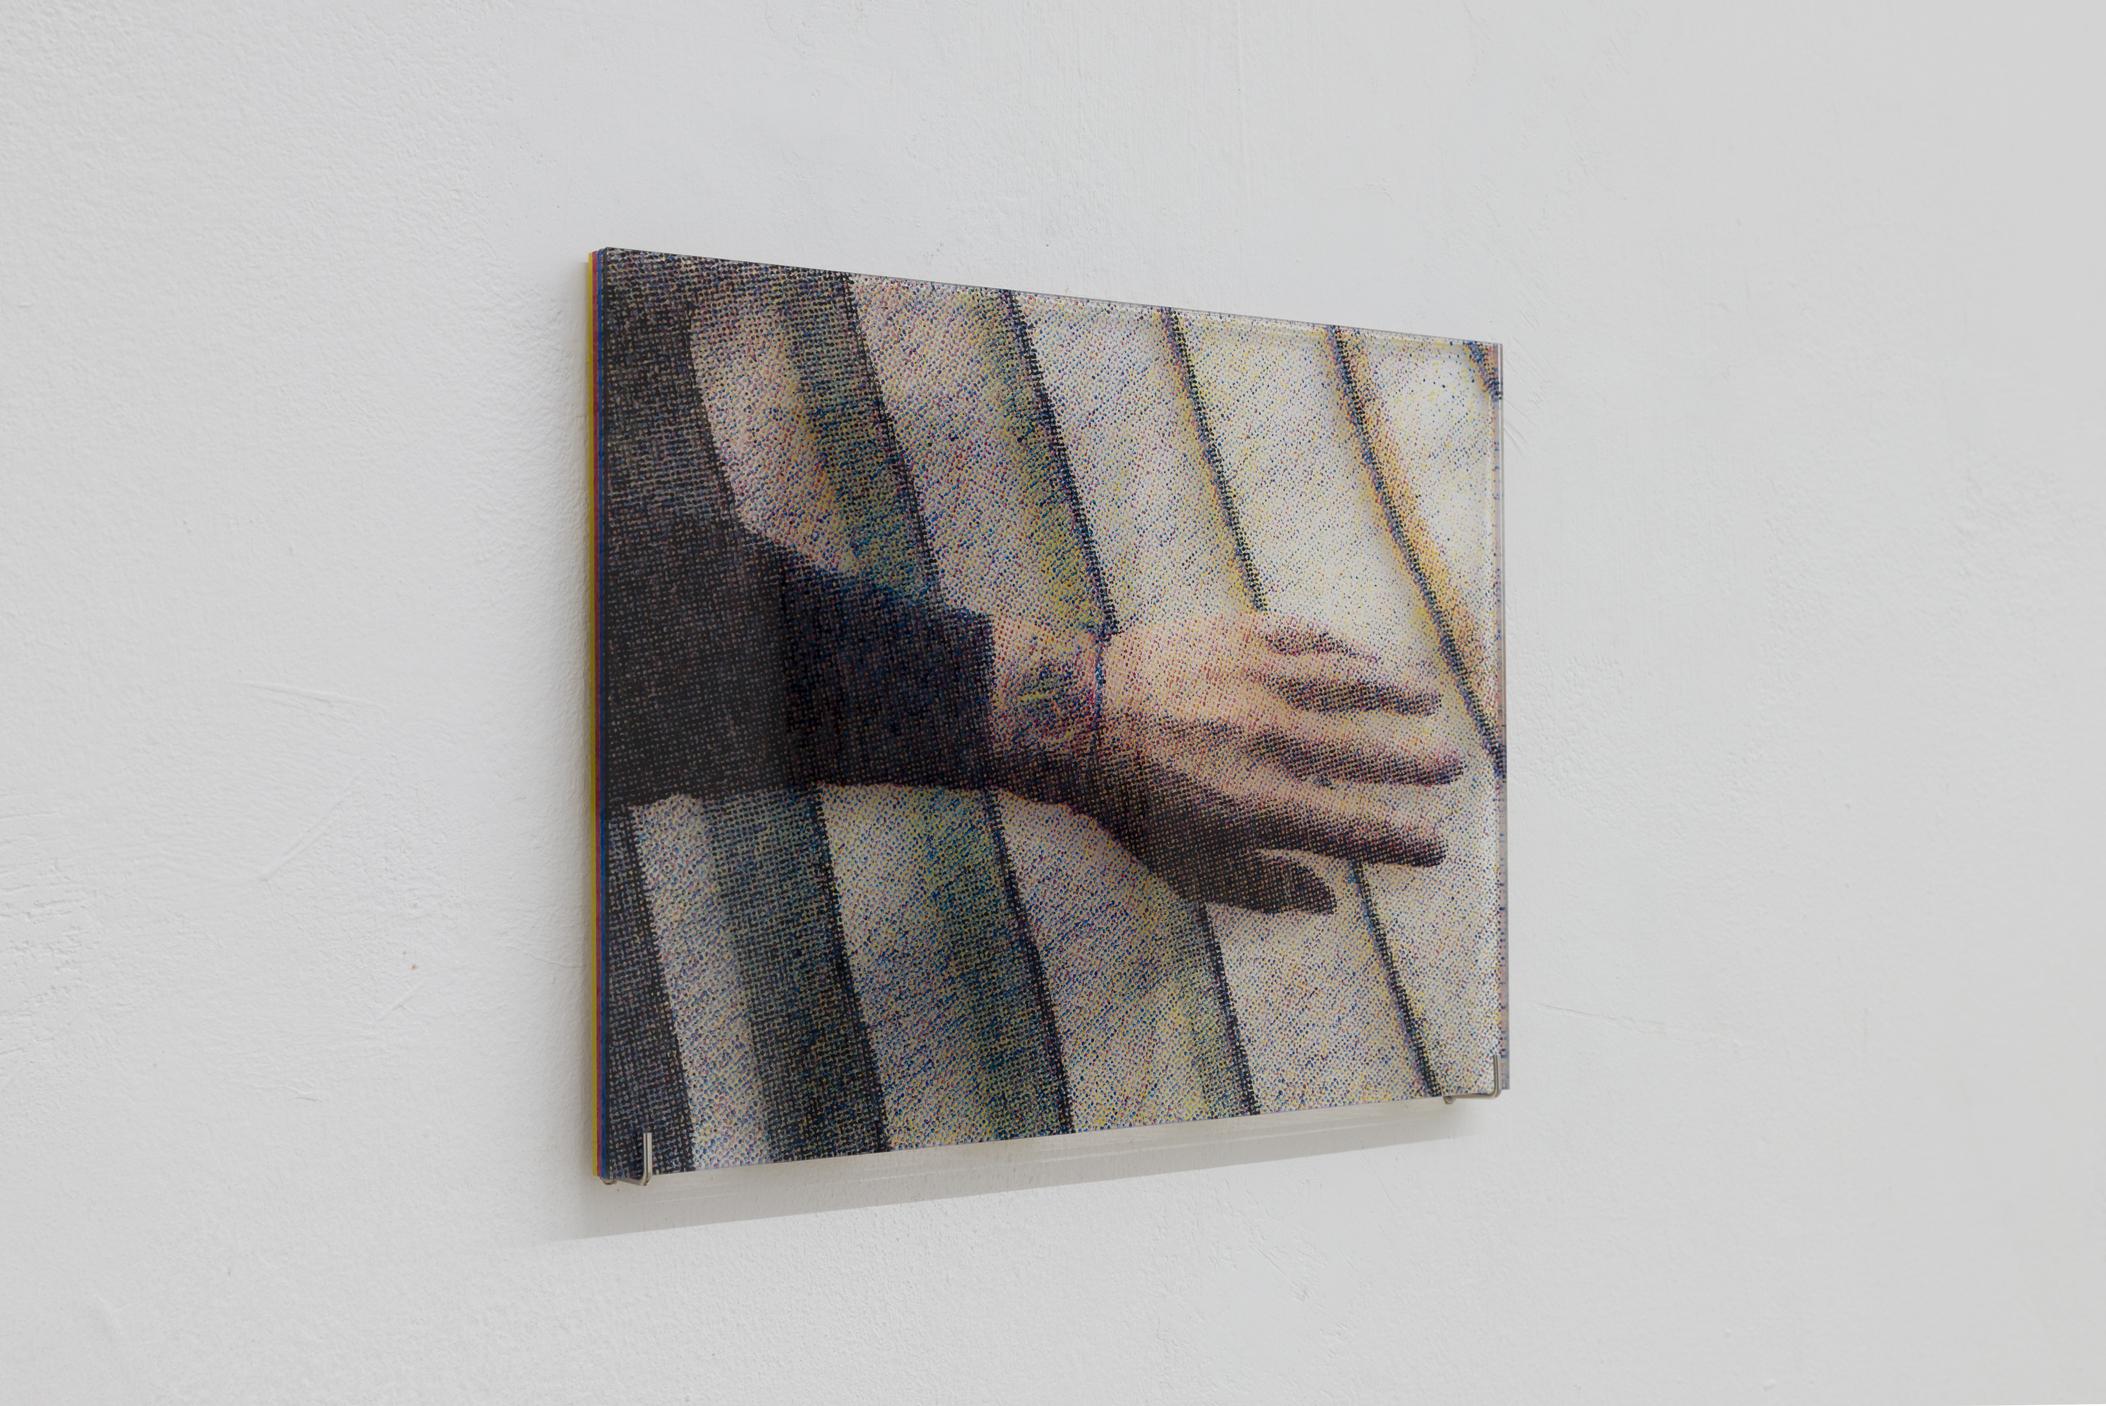 Yuki Higashino, Portrait of Luca Frei, Acrylic paint on Plexiglas, 2016